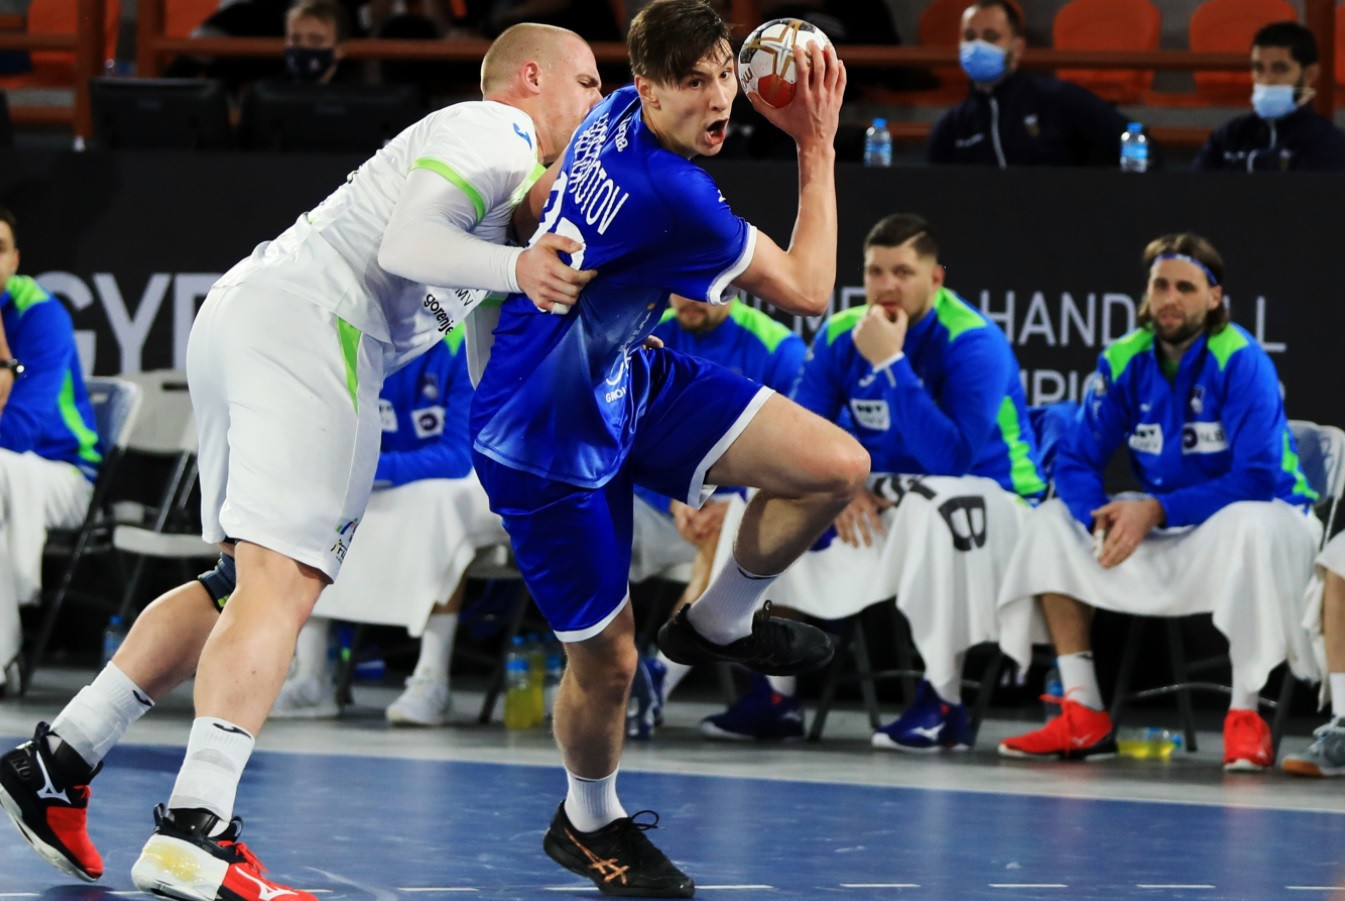 The Russian Handball Federation claimed their first win of the IHF World Men's Handball Championship after defeating Slovenia 31-25 ©Handball Egypt